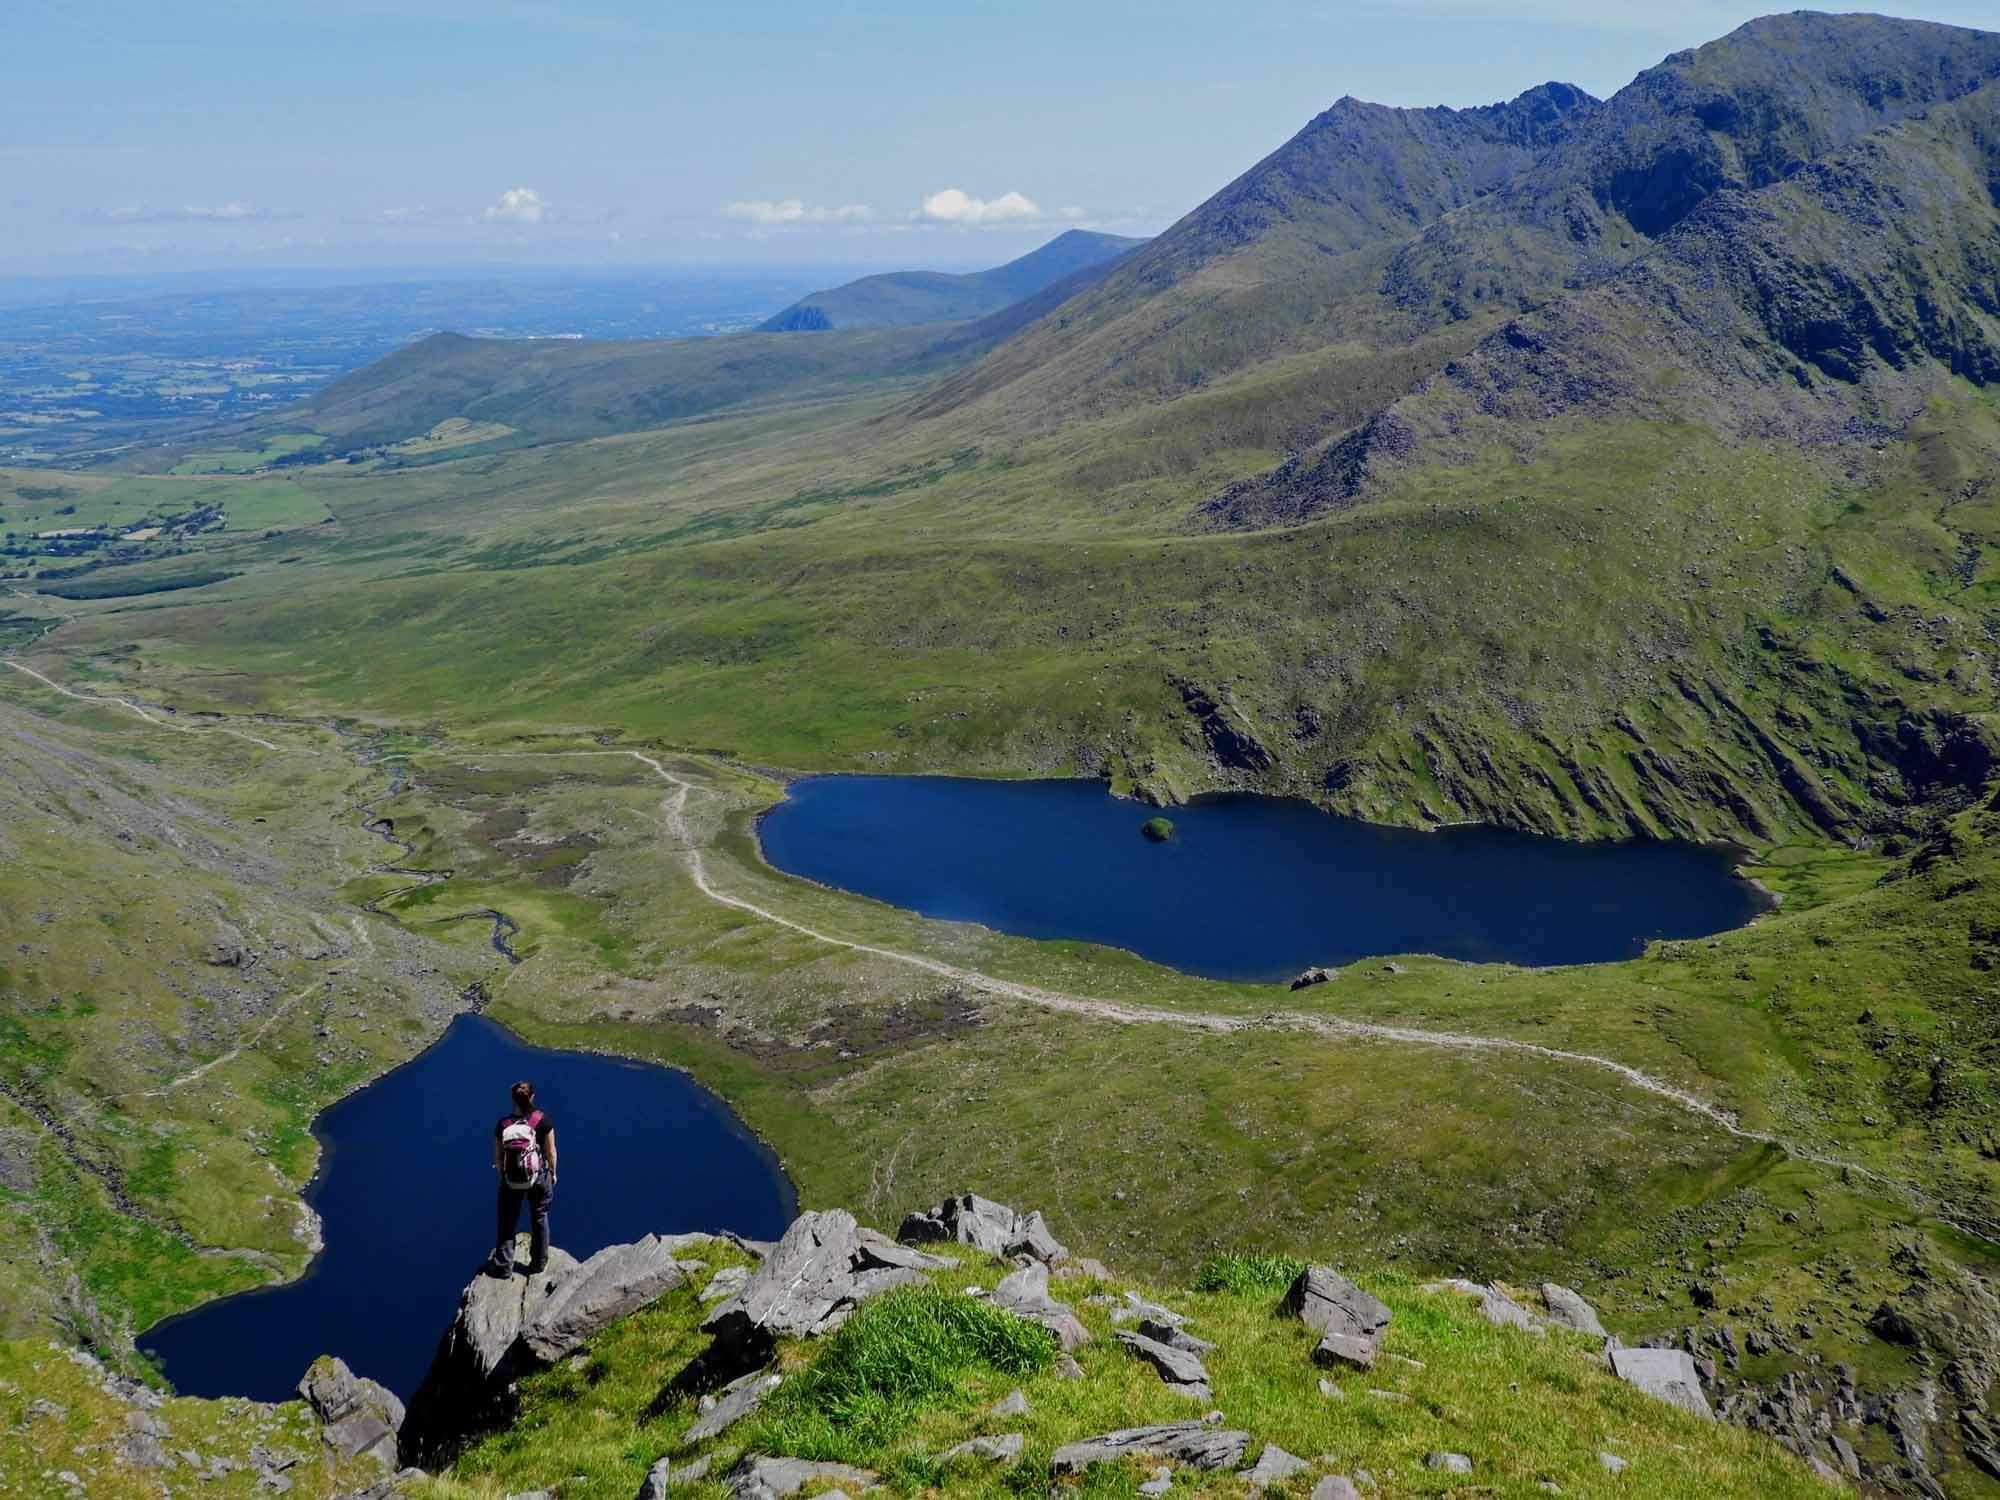 ireland-carrauntoohil-highest-mountain-peak-lake-view.jpg